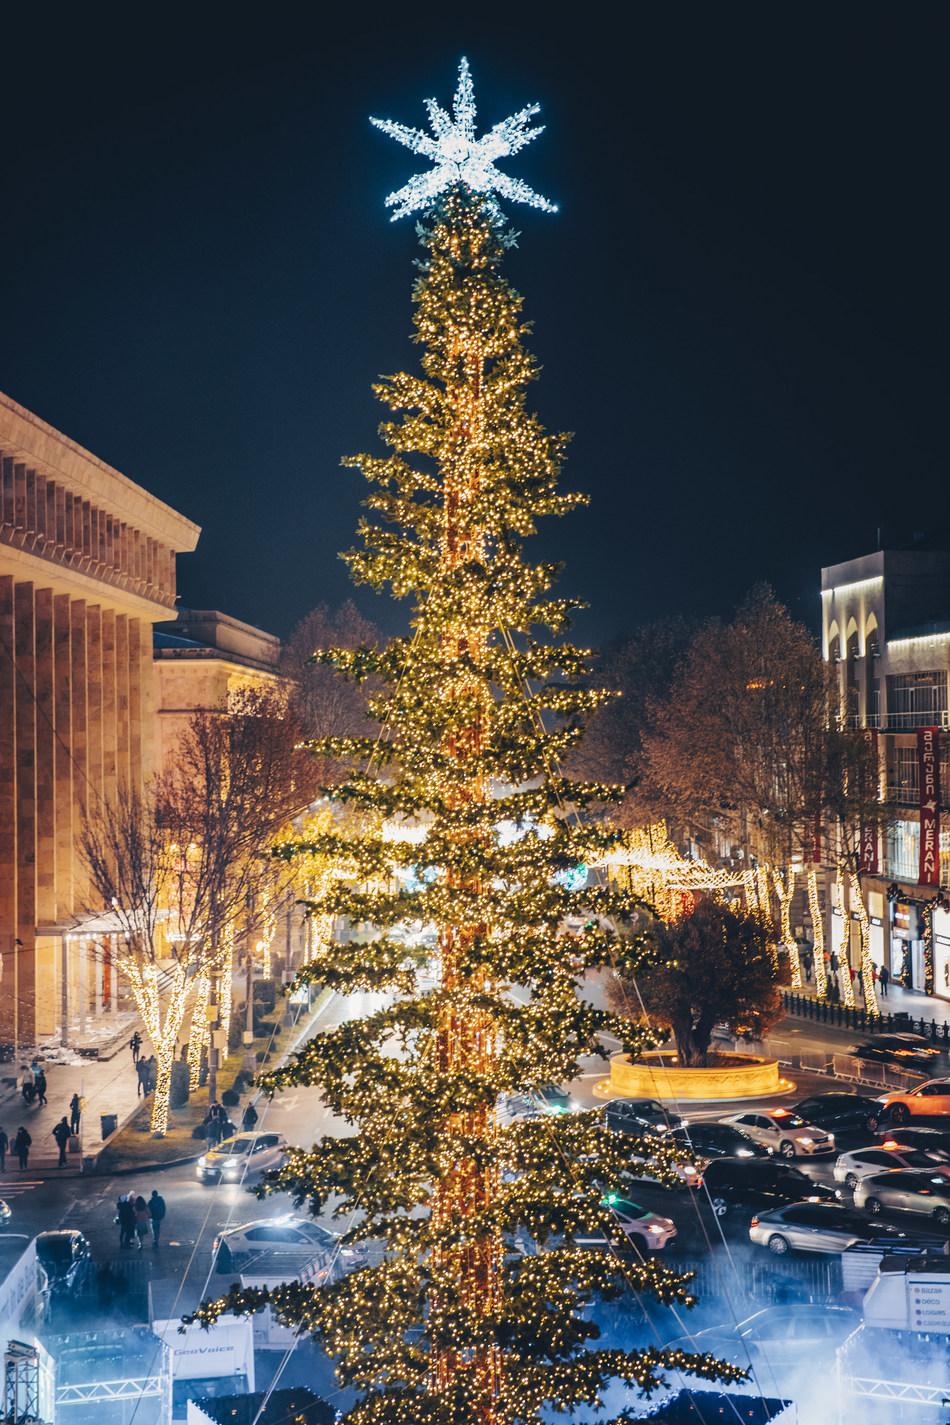 Tbilisi's Main Christmas Tree (Photographs by Davit Tabagari)